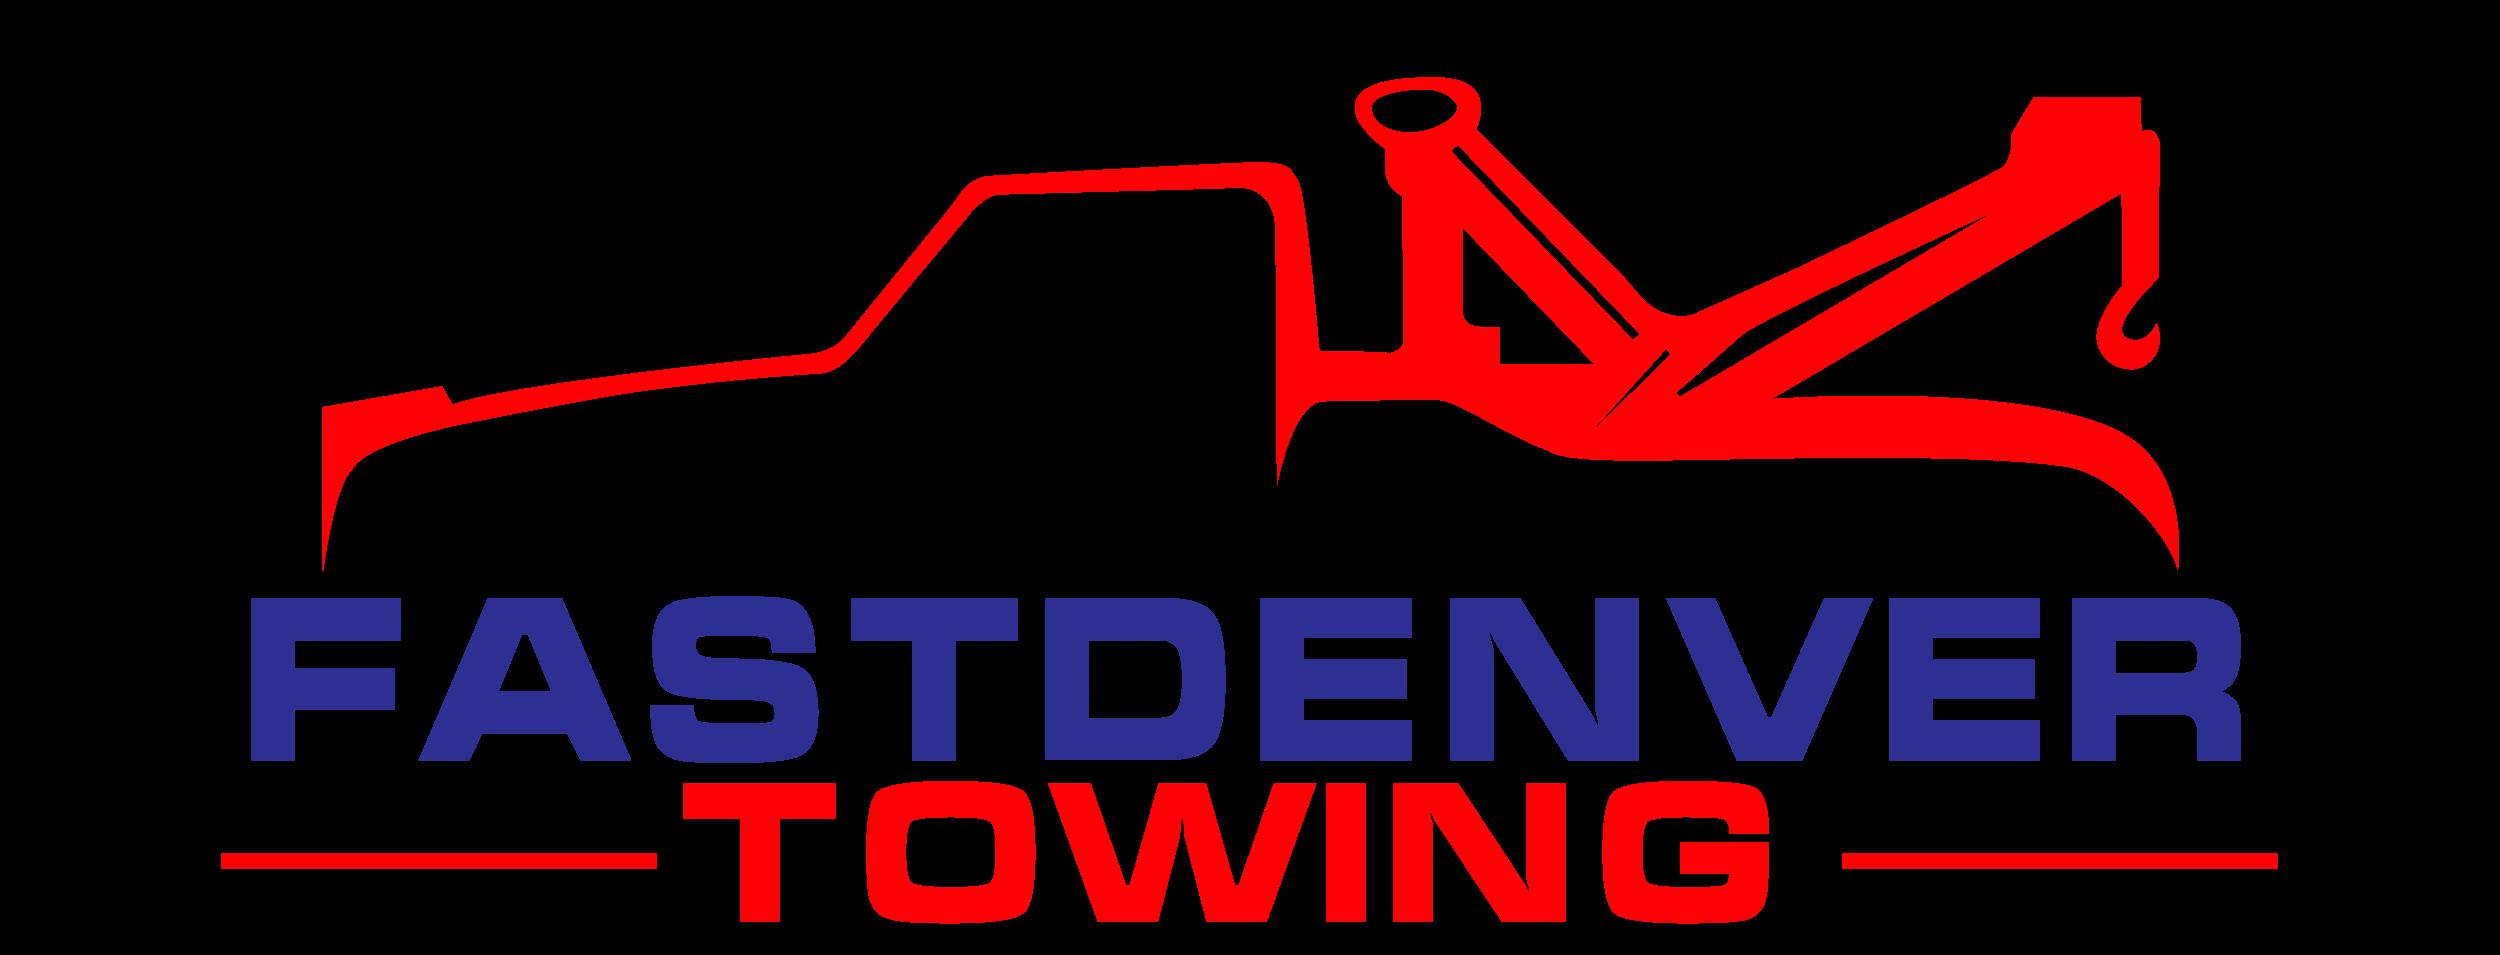 Fast Denver Towing png.png